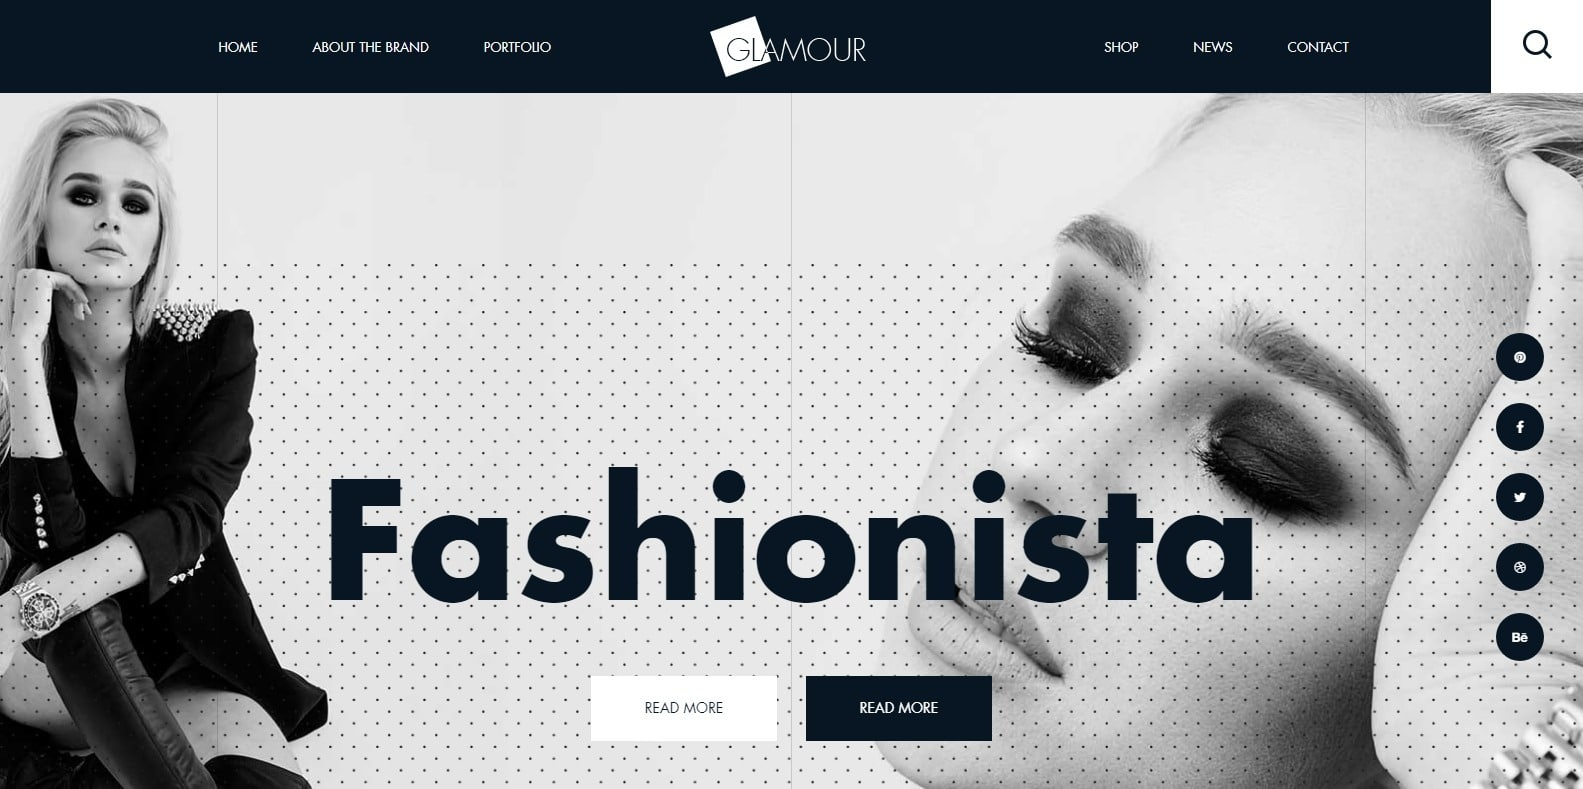 glamour-shop-website-template